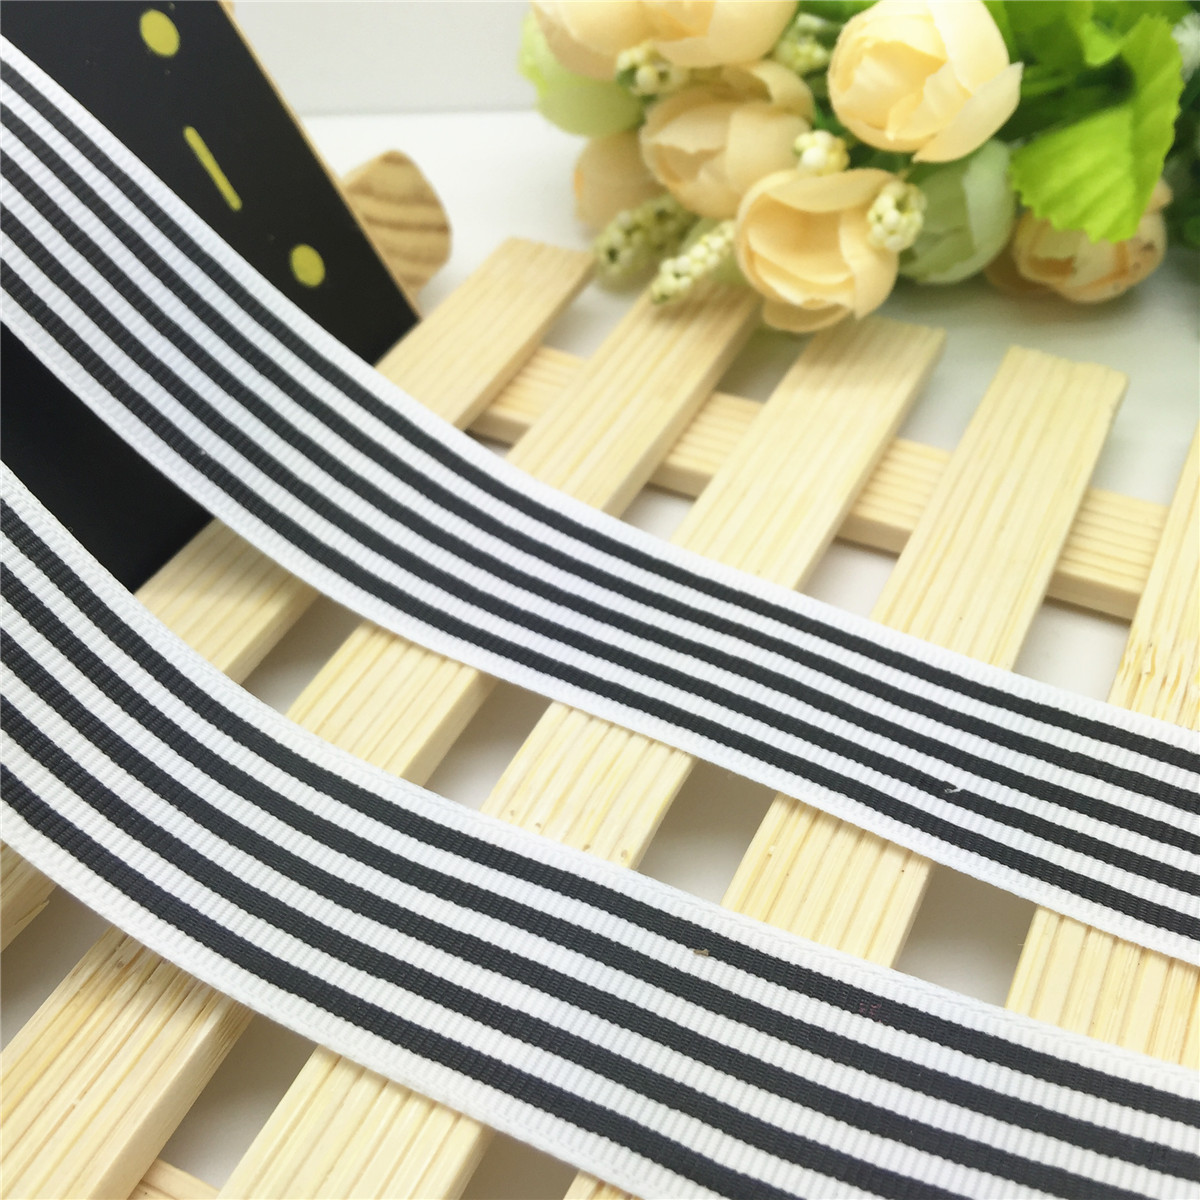 5 Yards 1/'/' 25mm Multicolor Fringe line Printed Grosgrain Ribbon Hair Bow Sewing